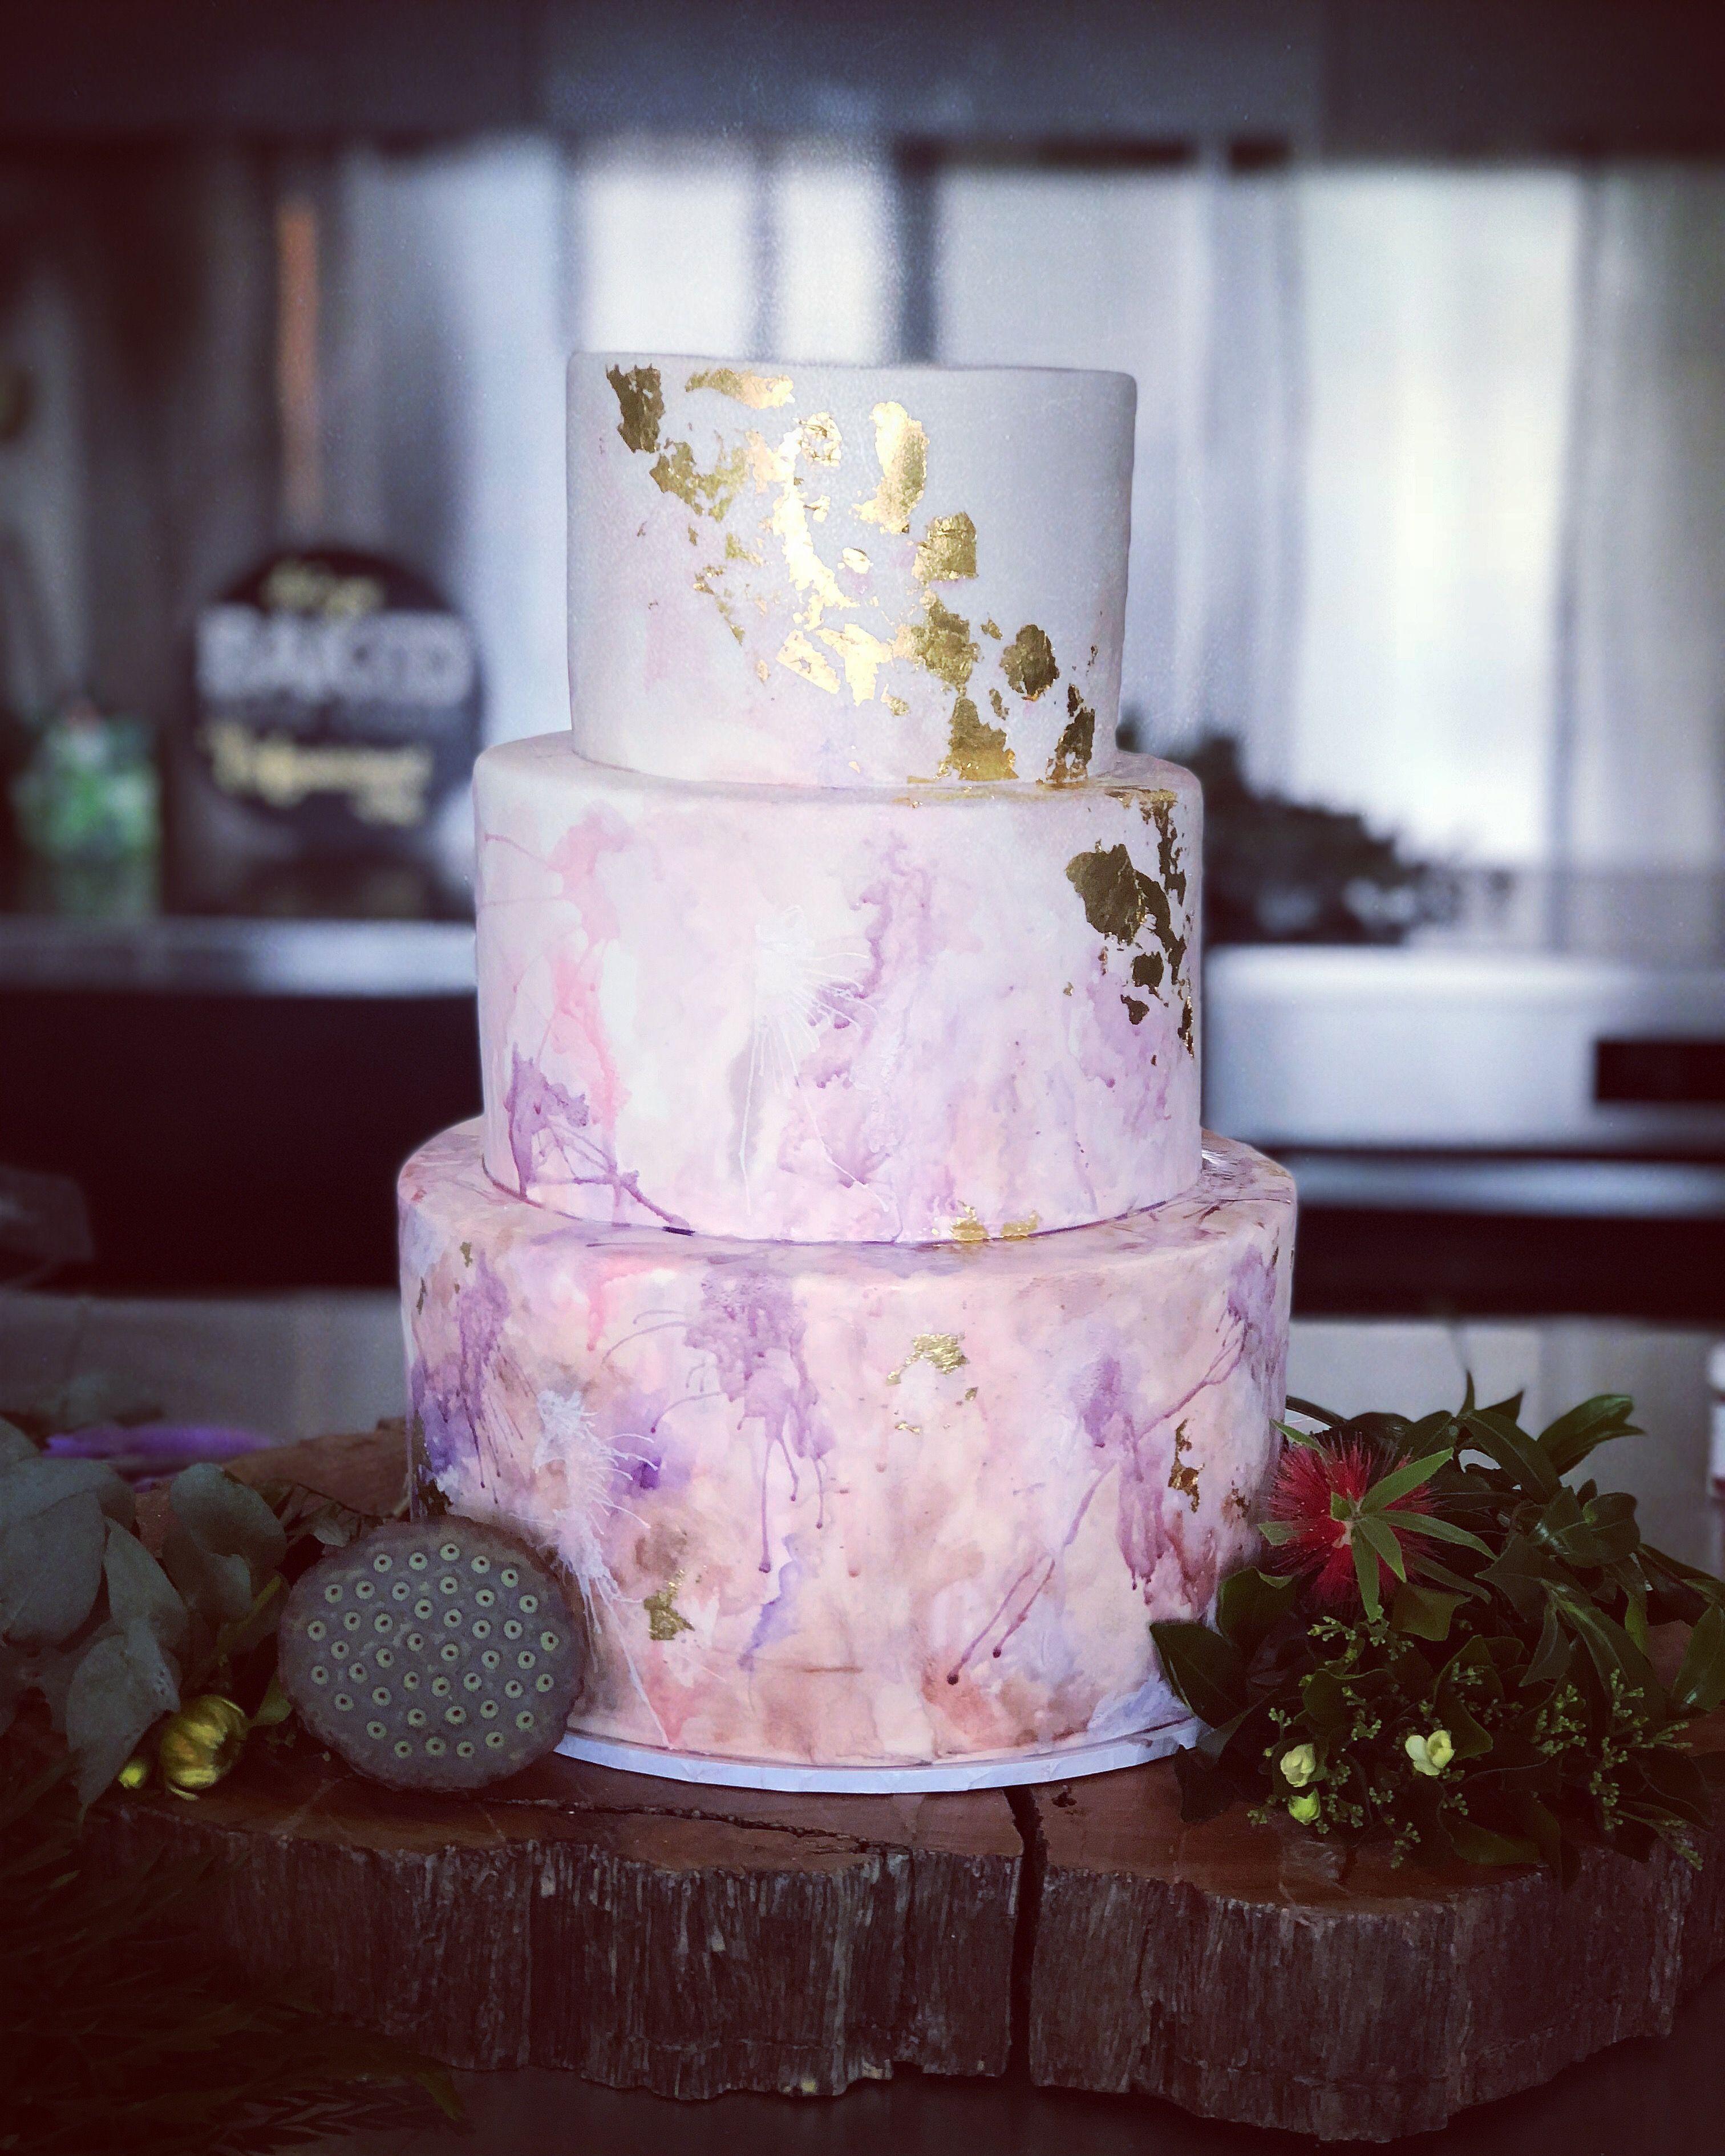 BAKED GC CAKE CO Gold Coast AUSTRALIA Painted wedding Cakes www.bakedgc.com.au  </p> </div><!-- .center-block .entry-content --> </article><!-- #post-## -->  <nav class=